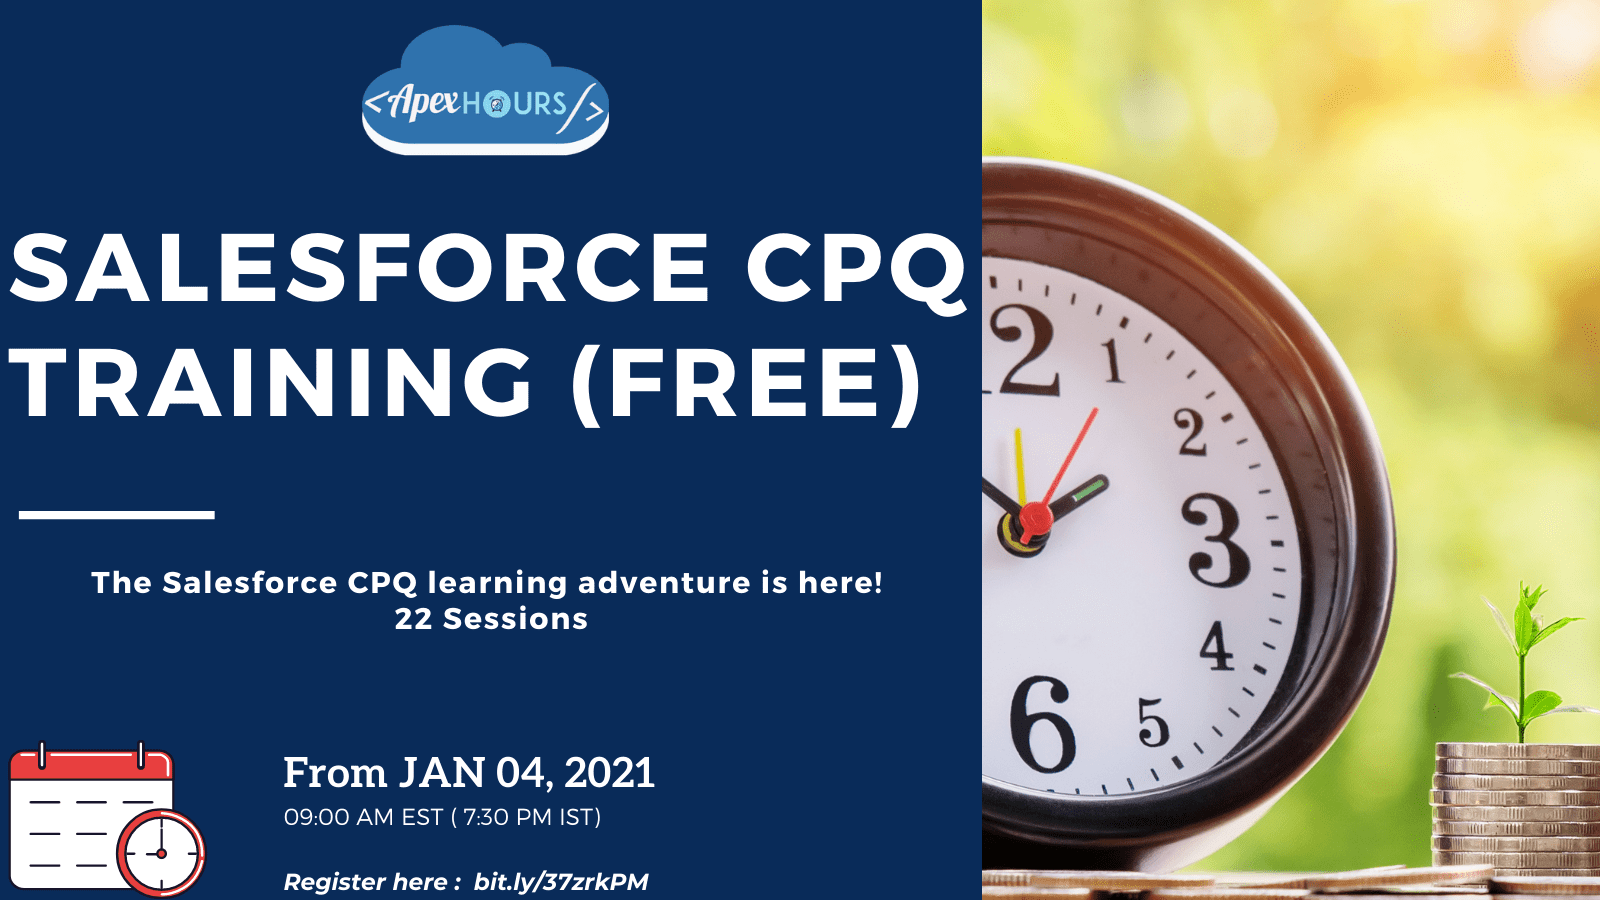 Salesforce CPQ Training Free.